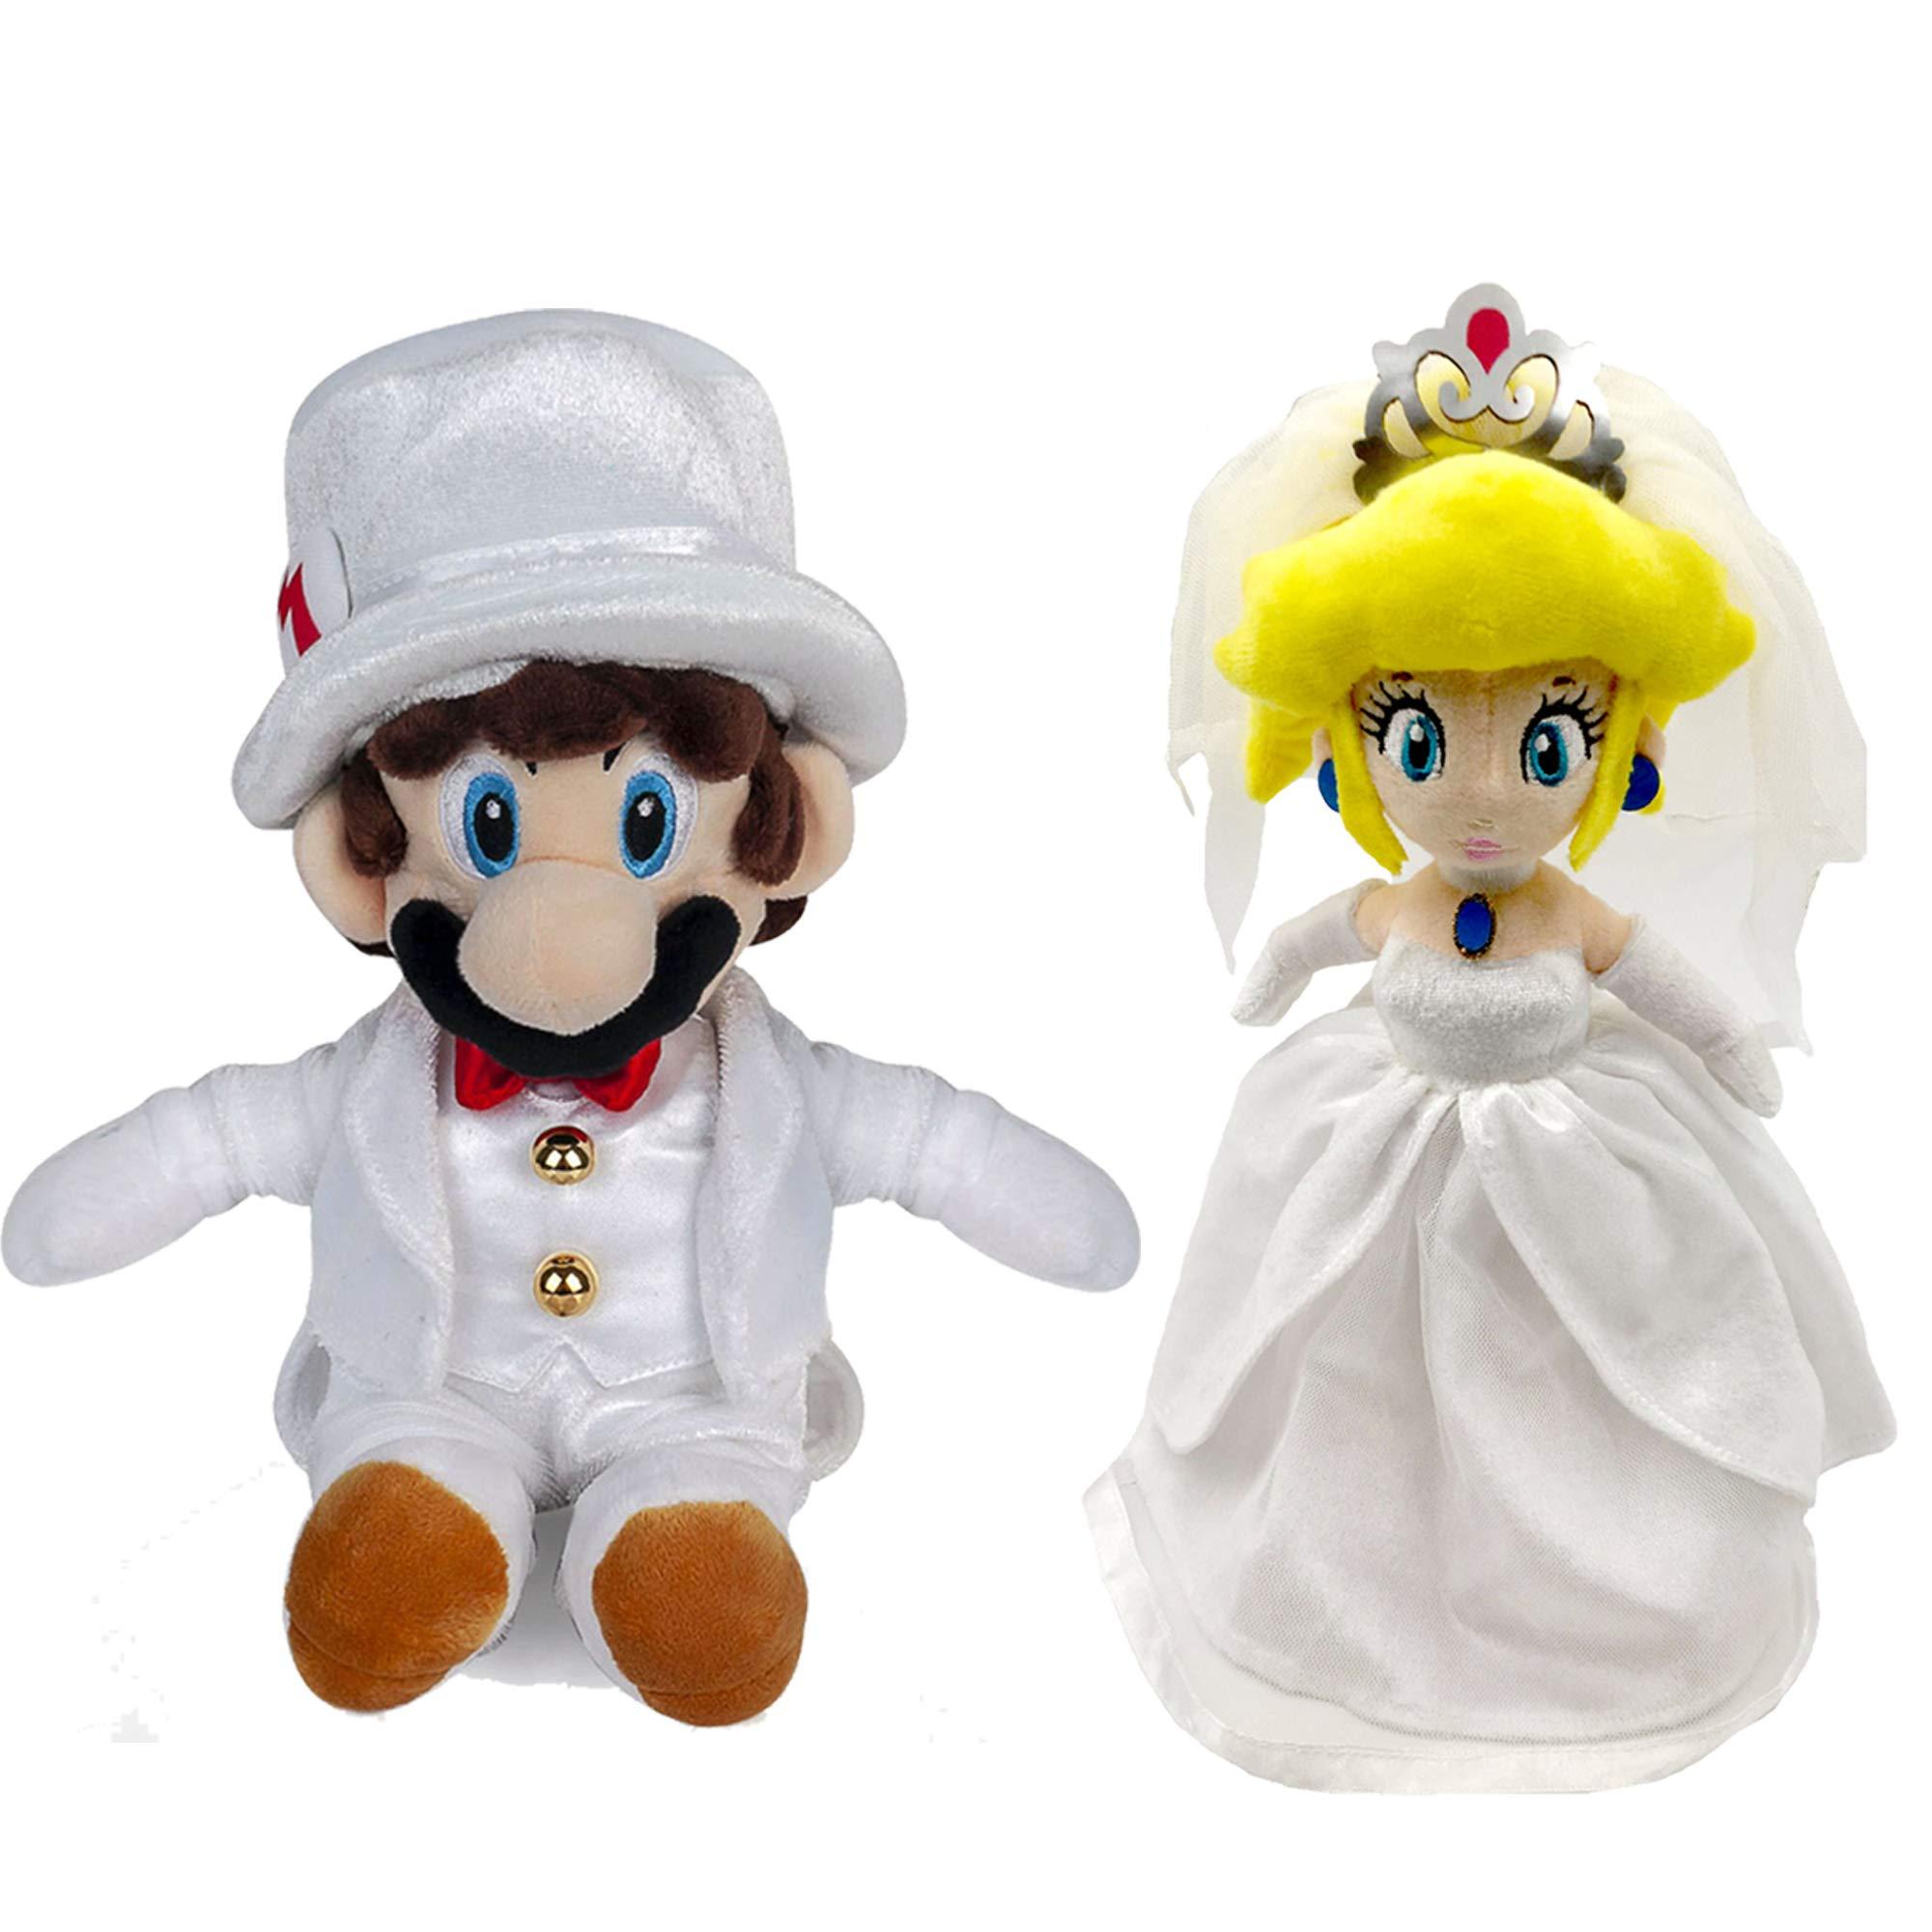 Super Mario Odyssey Princess Peach Mario Wedding Dress Plush Toy Stuffed Animal (Pack of 2) by Generic